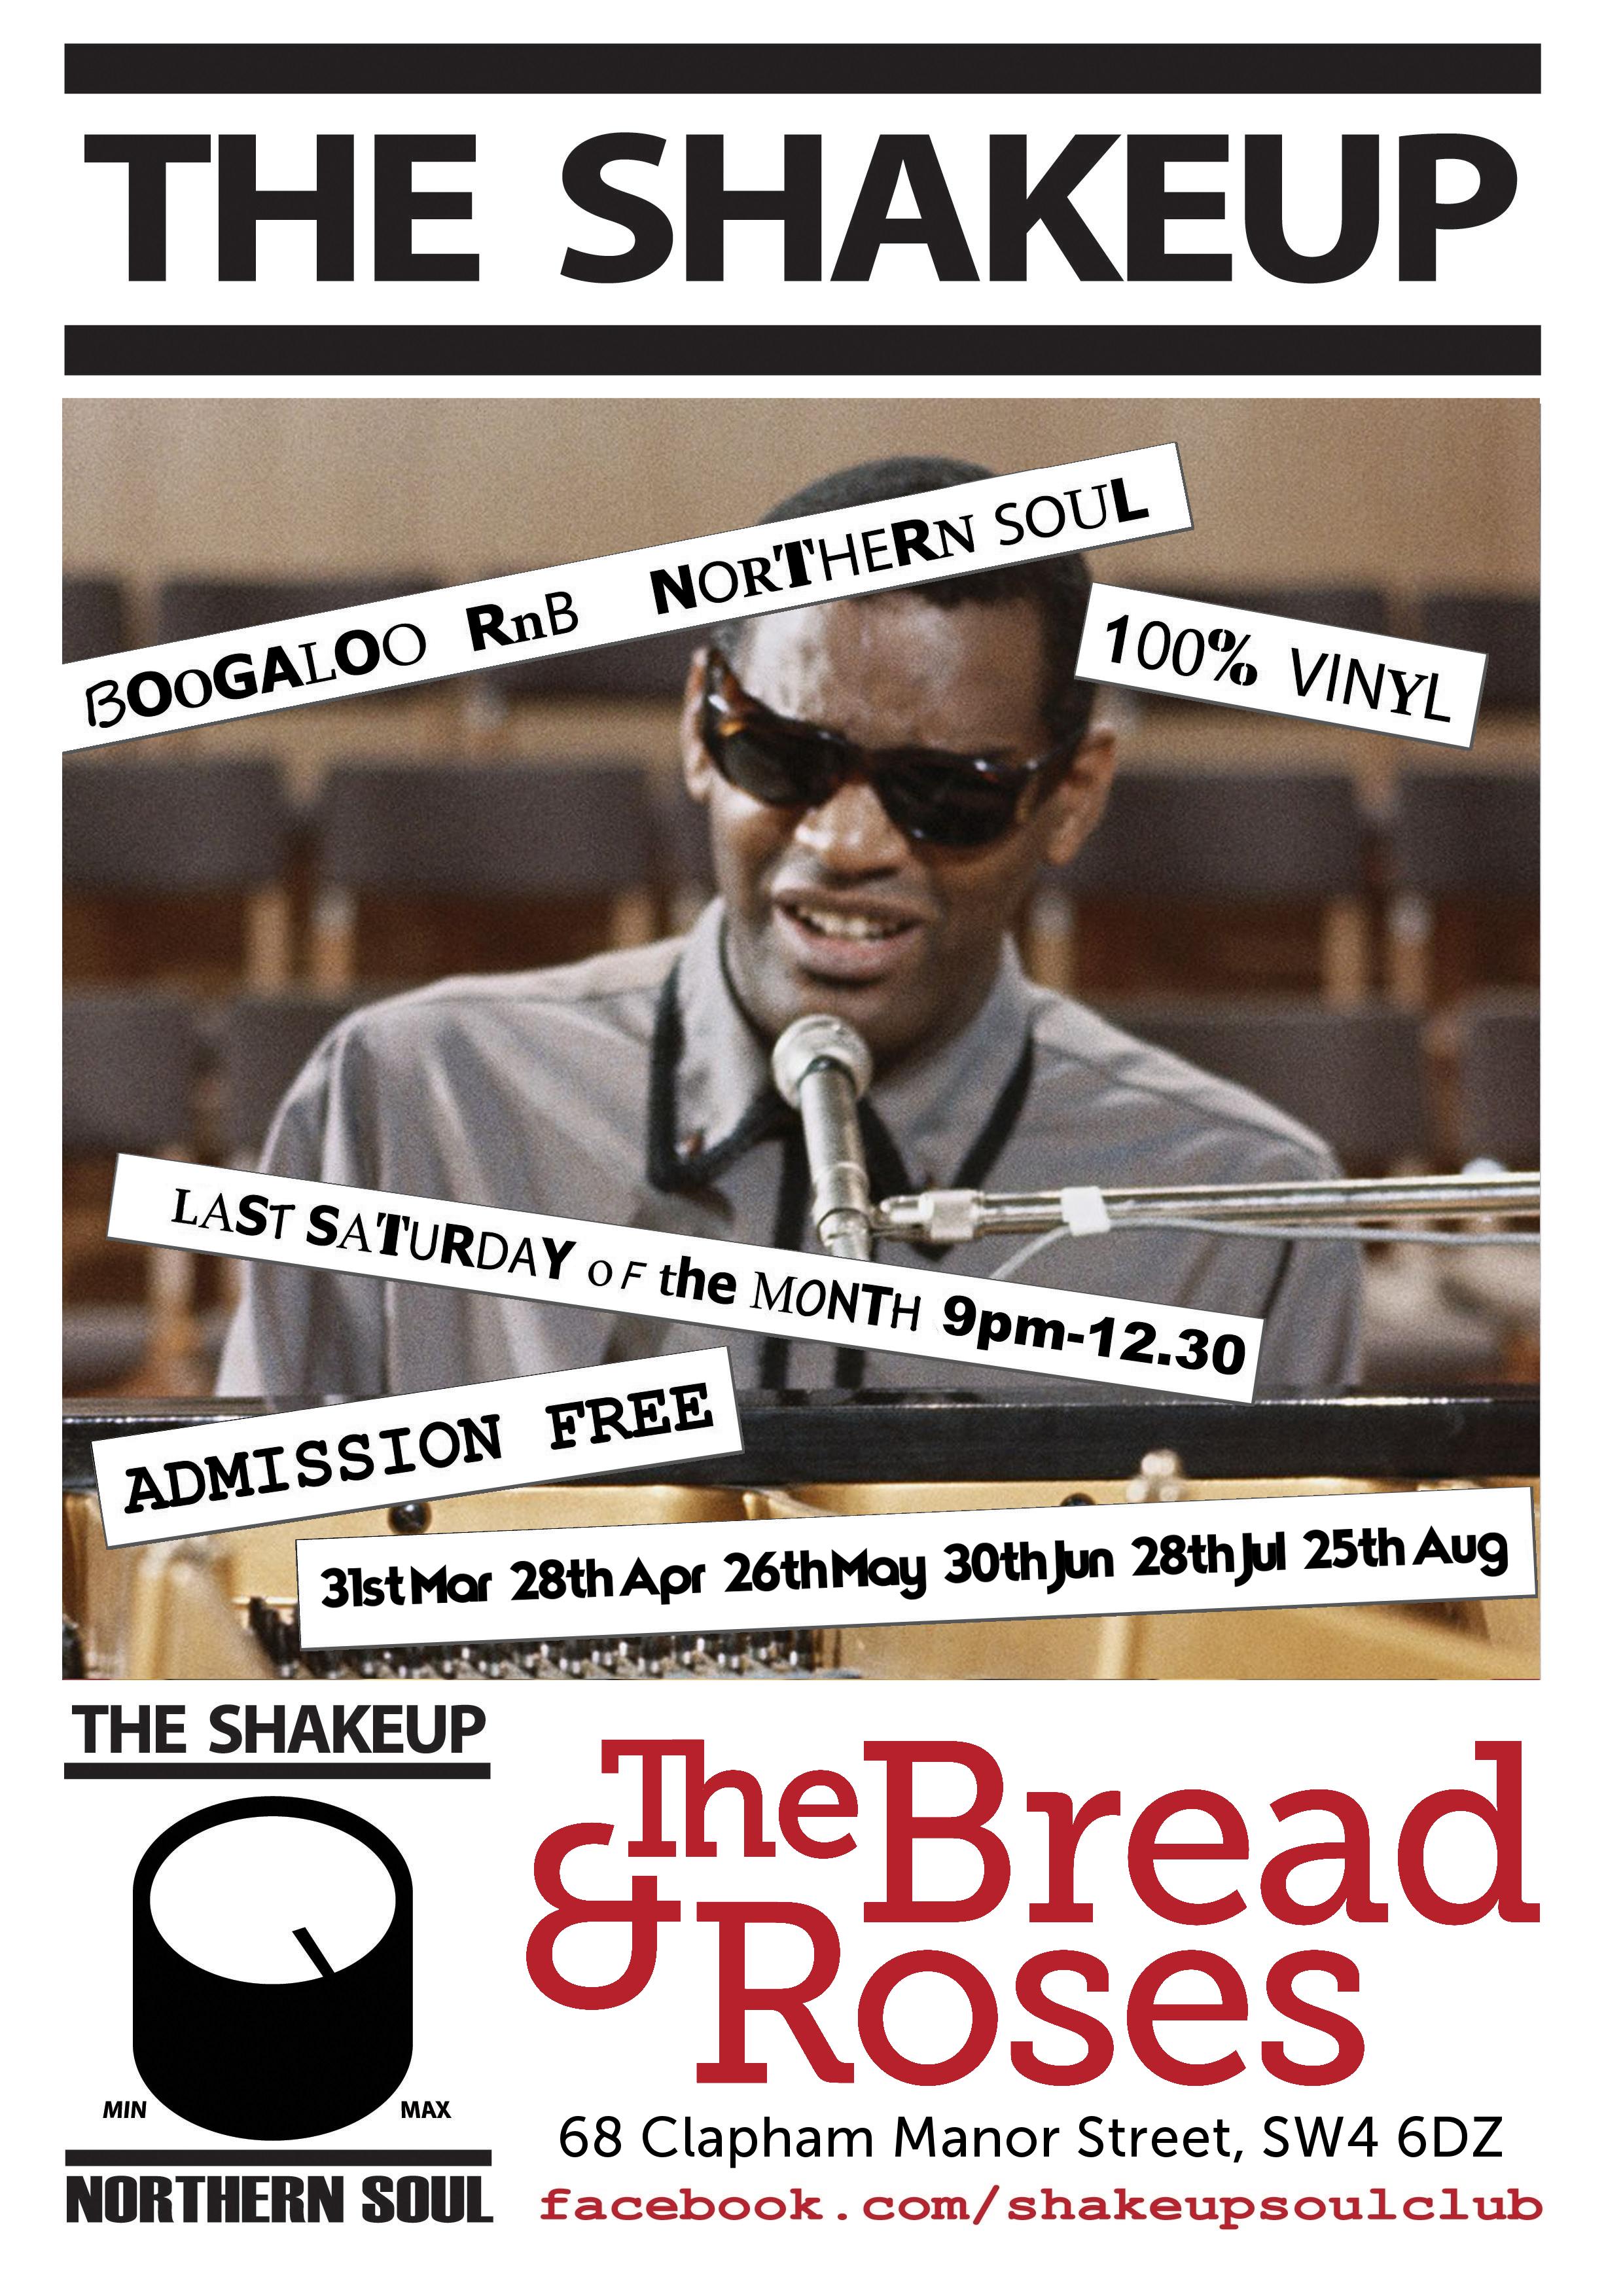 The Shakeup - Easter Saturday - Guest DJ Dave Duplock - London SW4 6DZ. Northern Soul, 60s Soul, Motown Boogaloo & Mod Jazz. 01/04/18